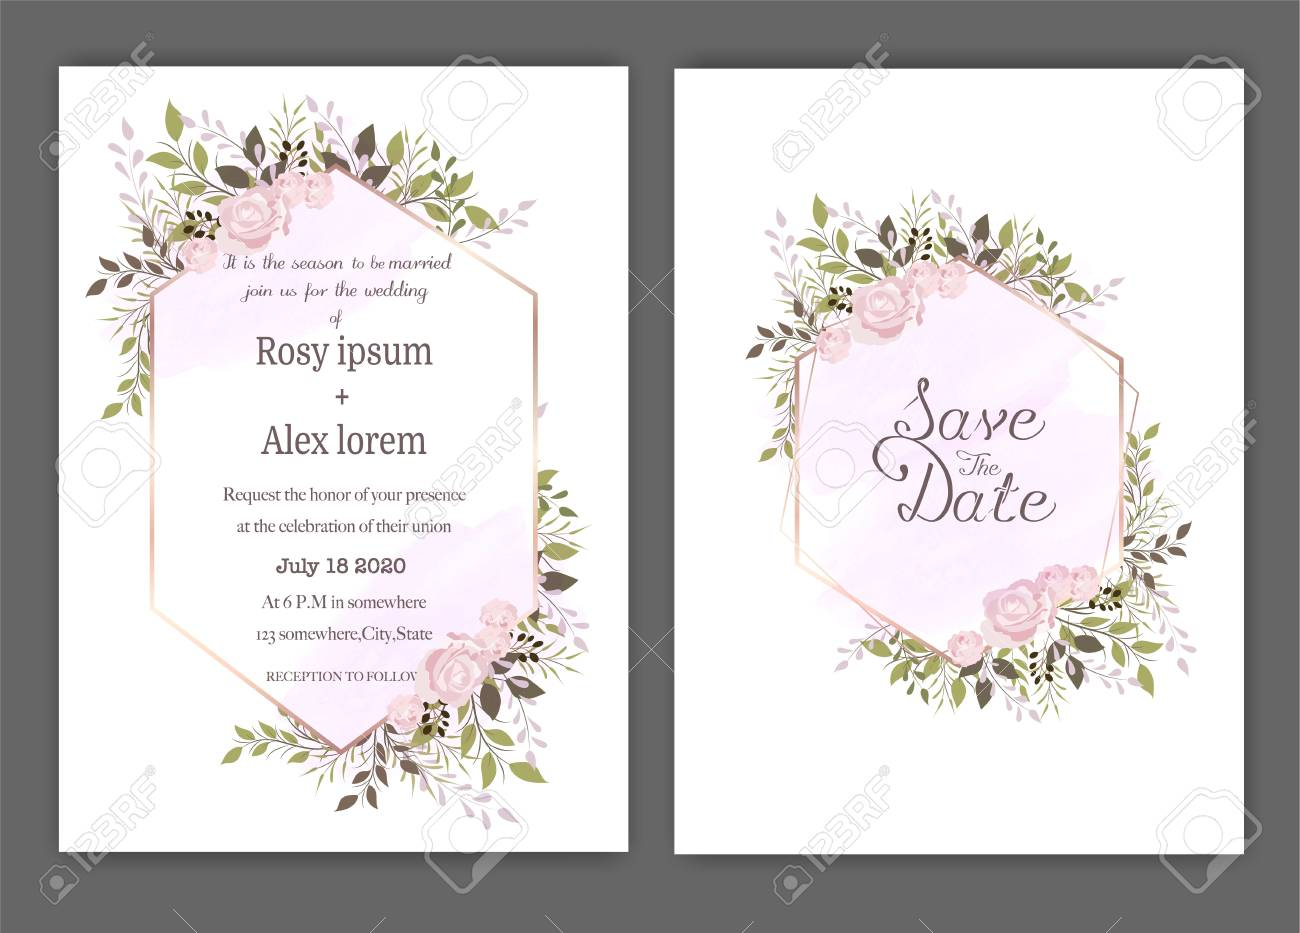 Wedding invite, invitation, save the date card design with elegant lavender garden anemone. - 125667175